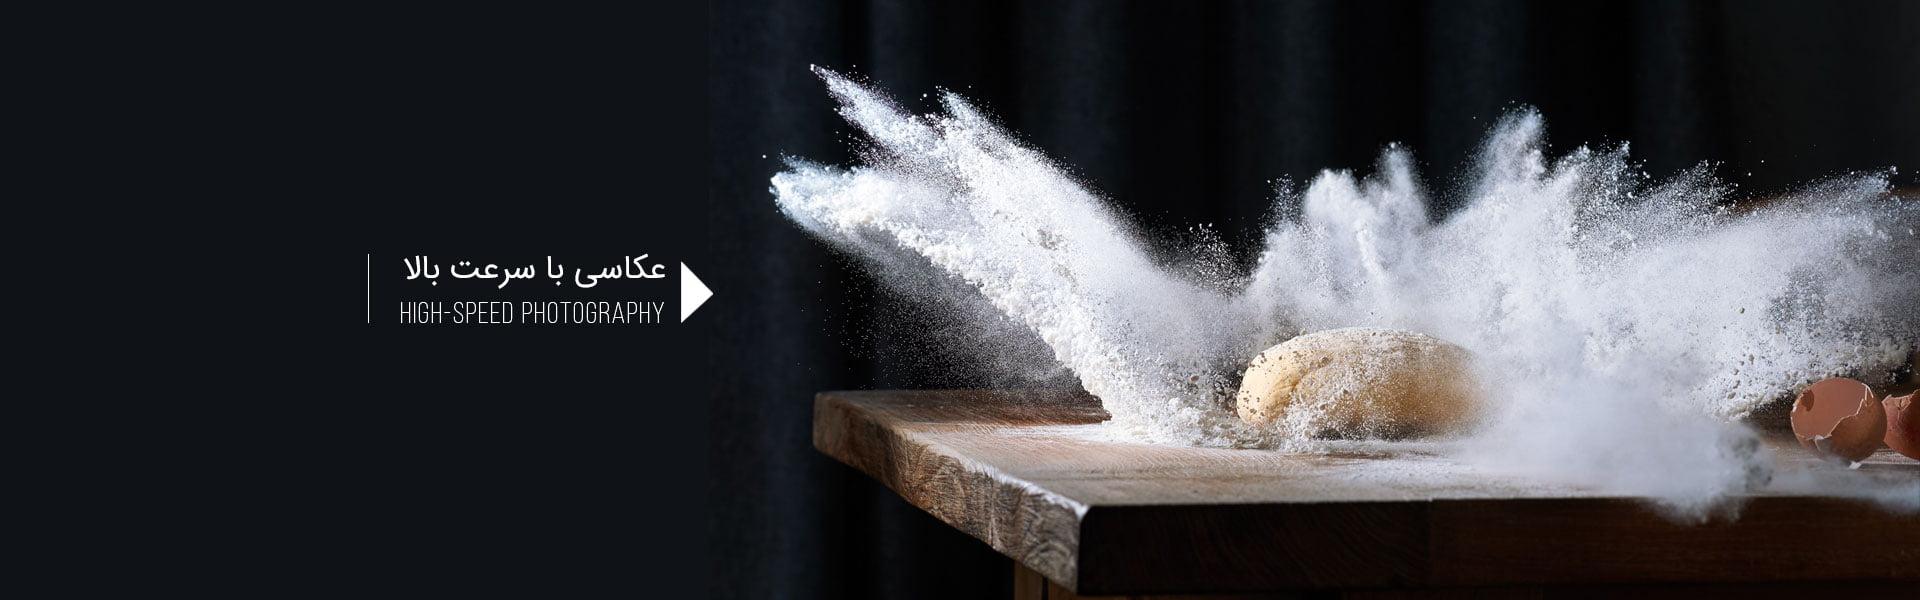 akasi sorate bala1 - عکاسی با سرعت بالا